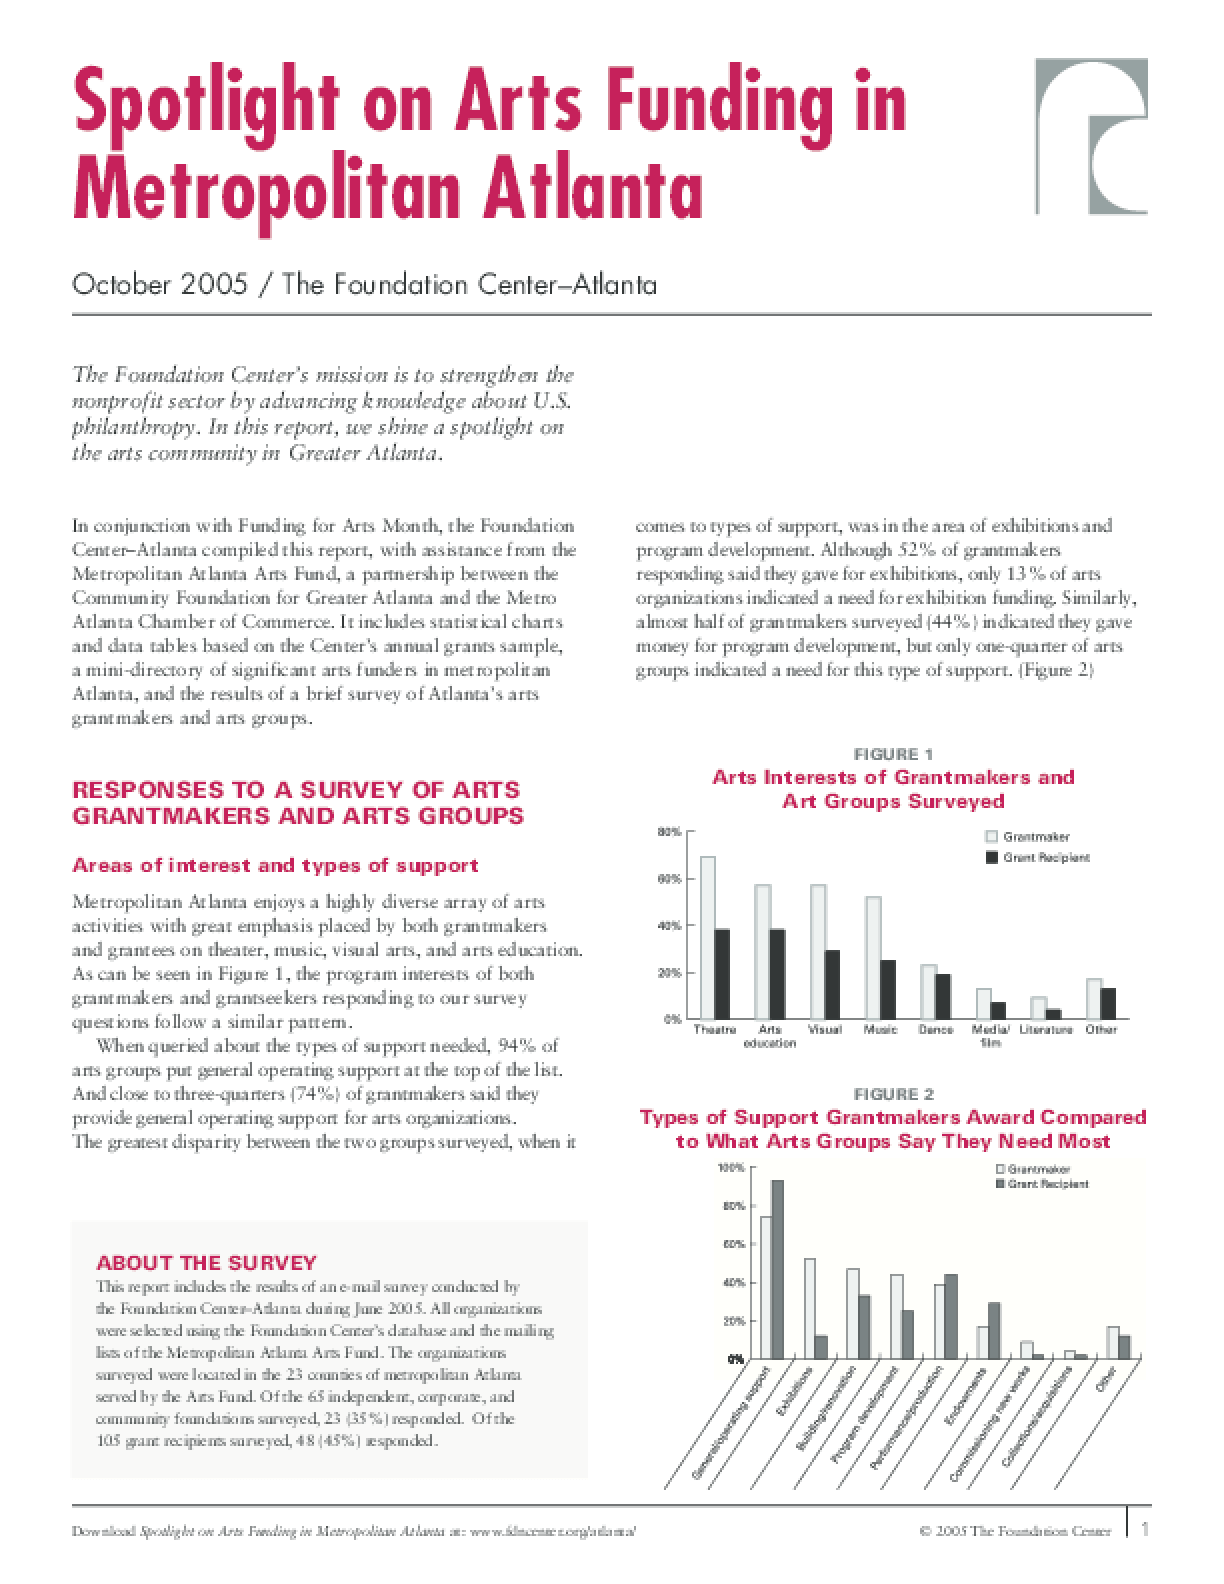 Spotlight on Arts Funding in Metropolitan Atlanta